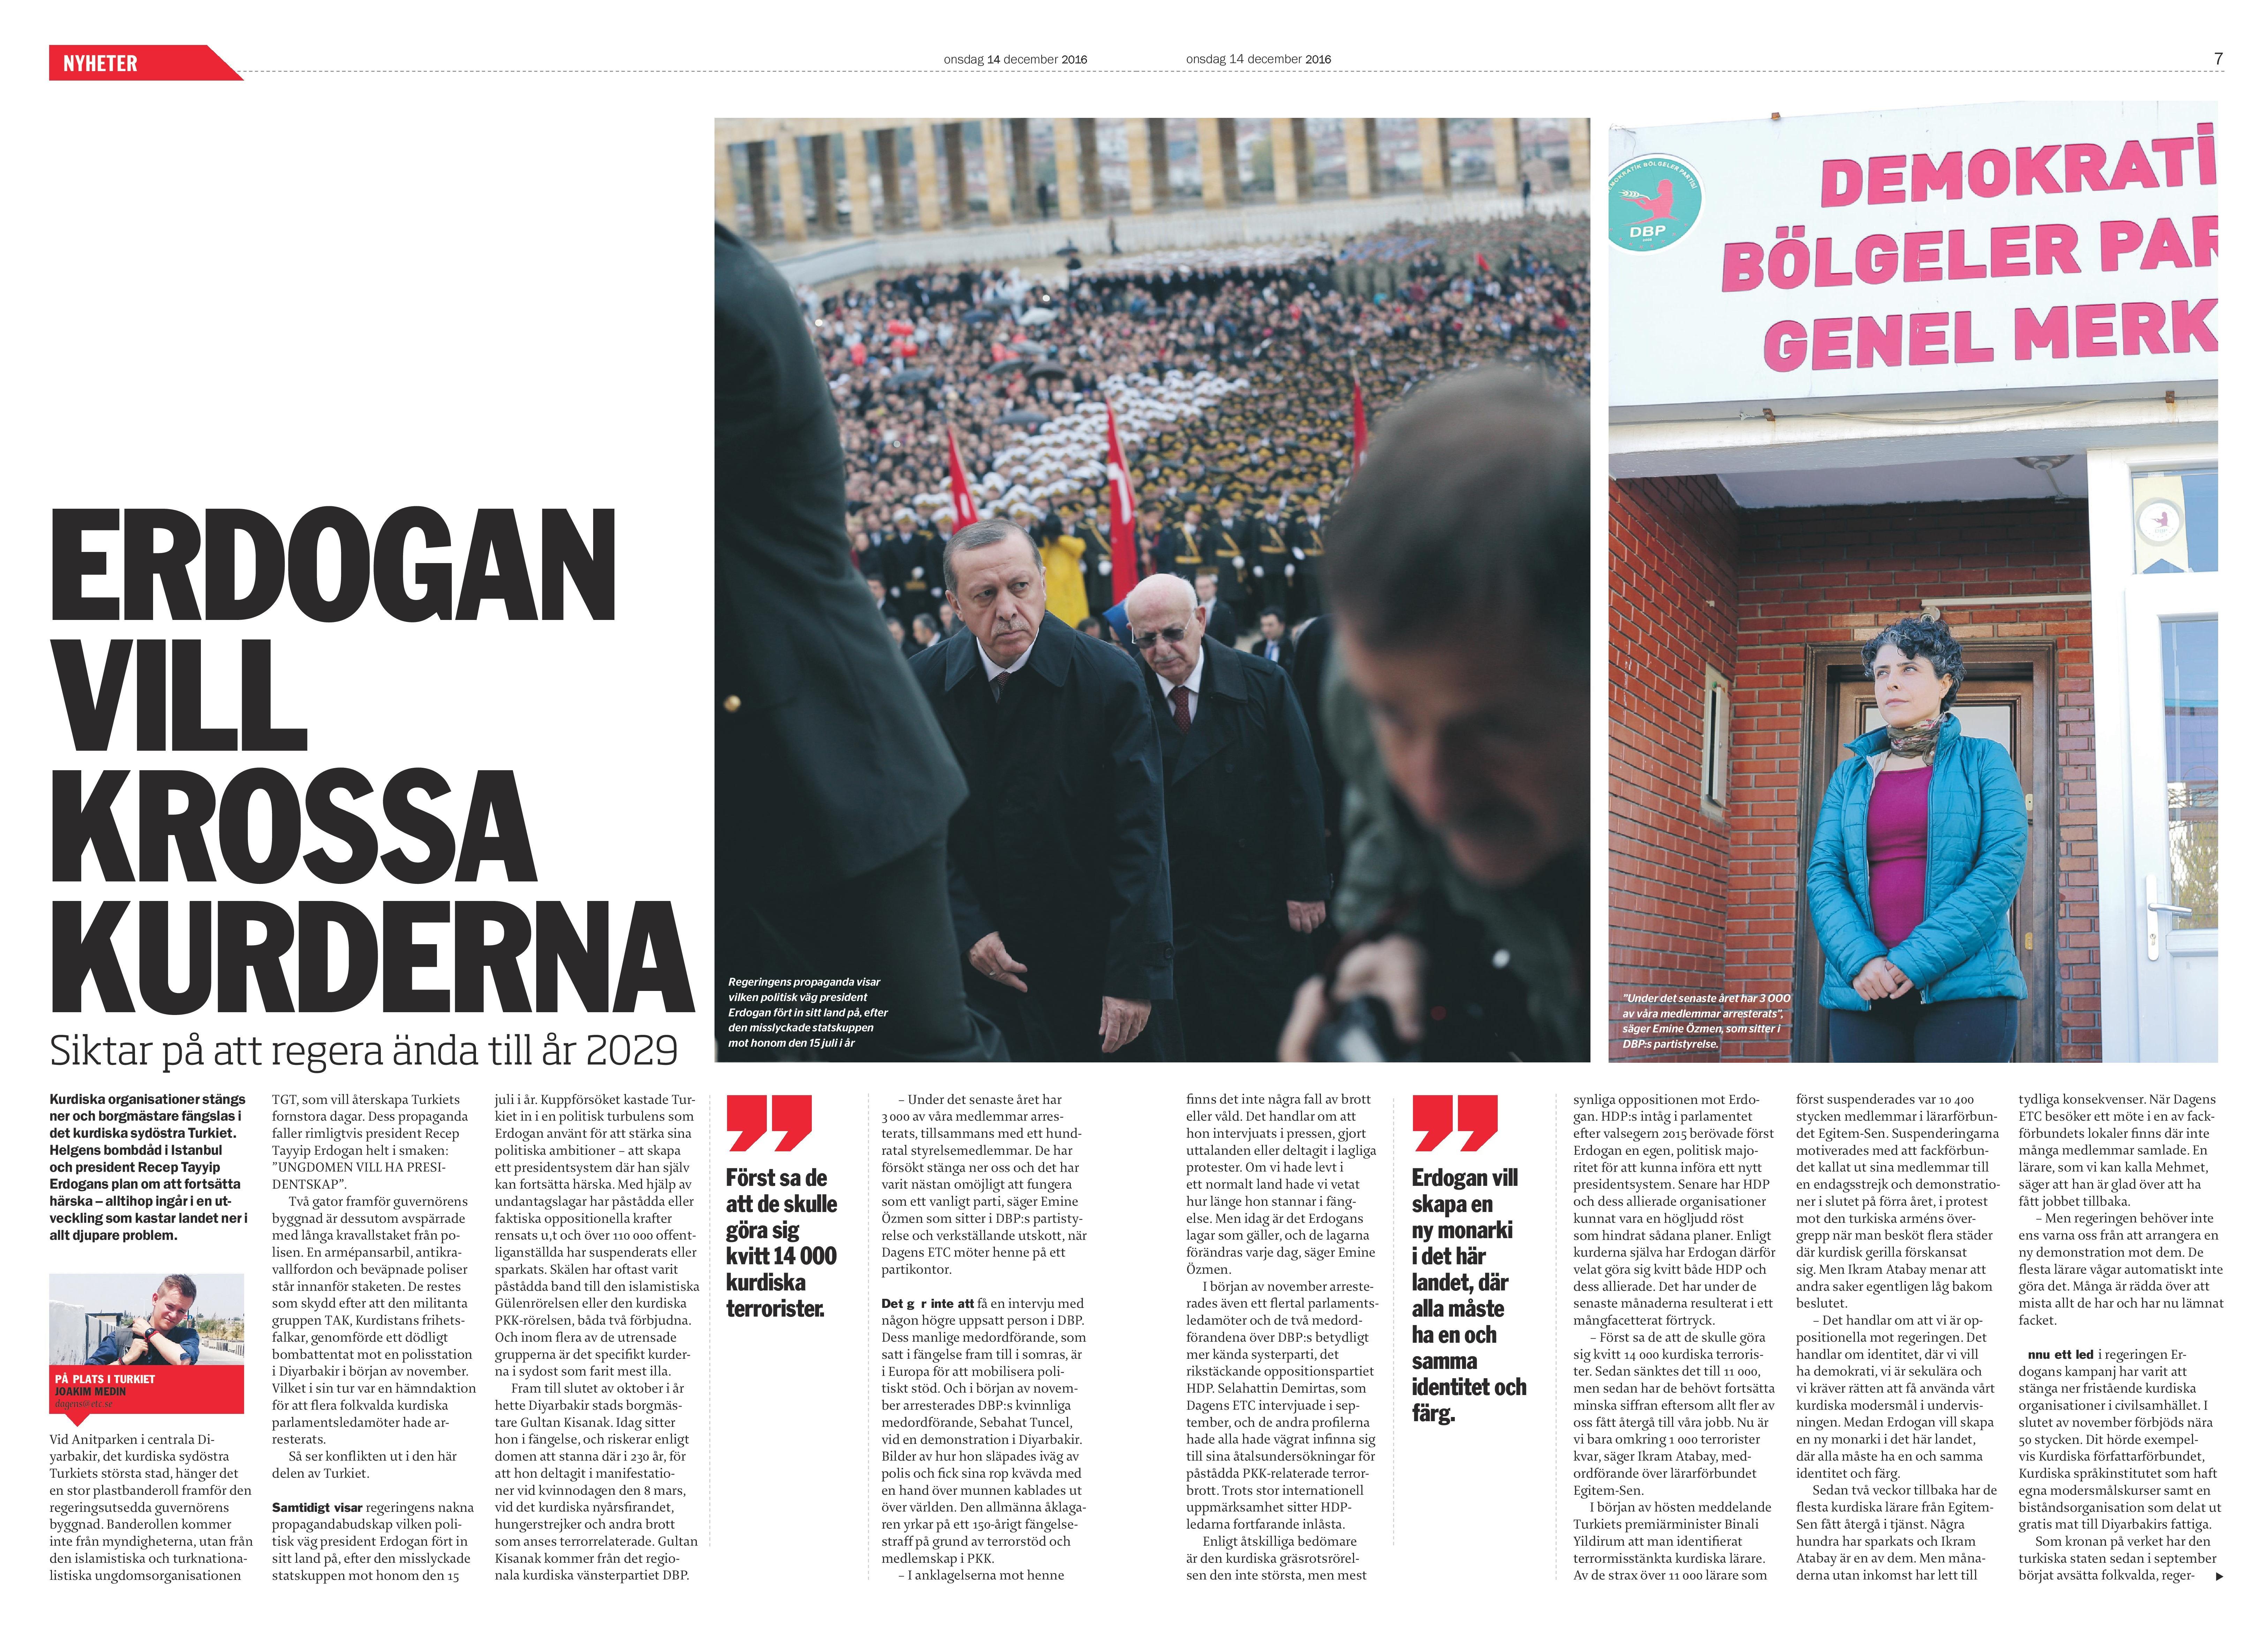 Turkiet, Dagens ETC 2016-12-14